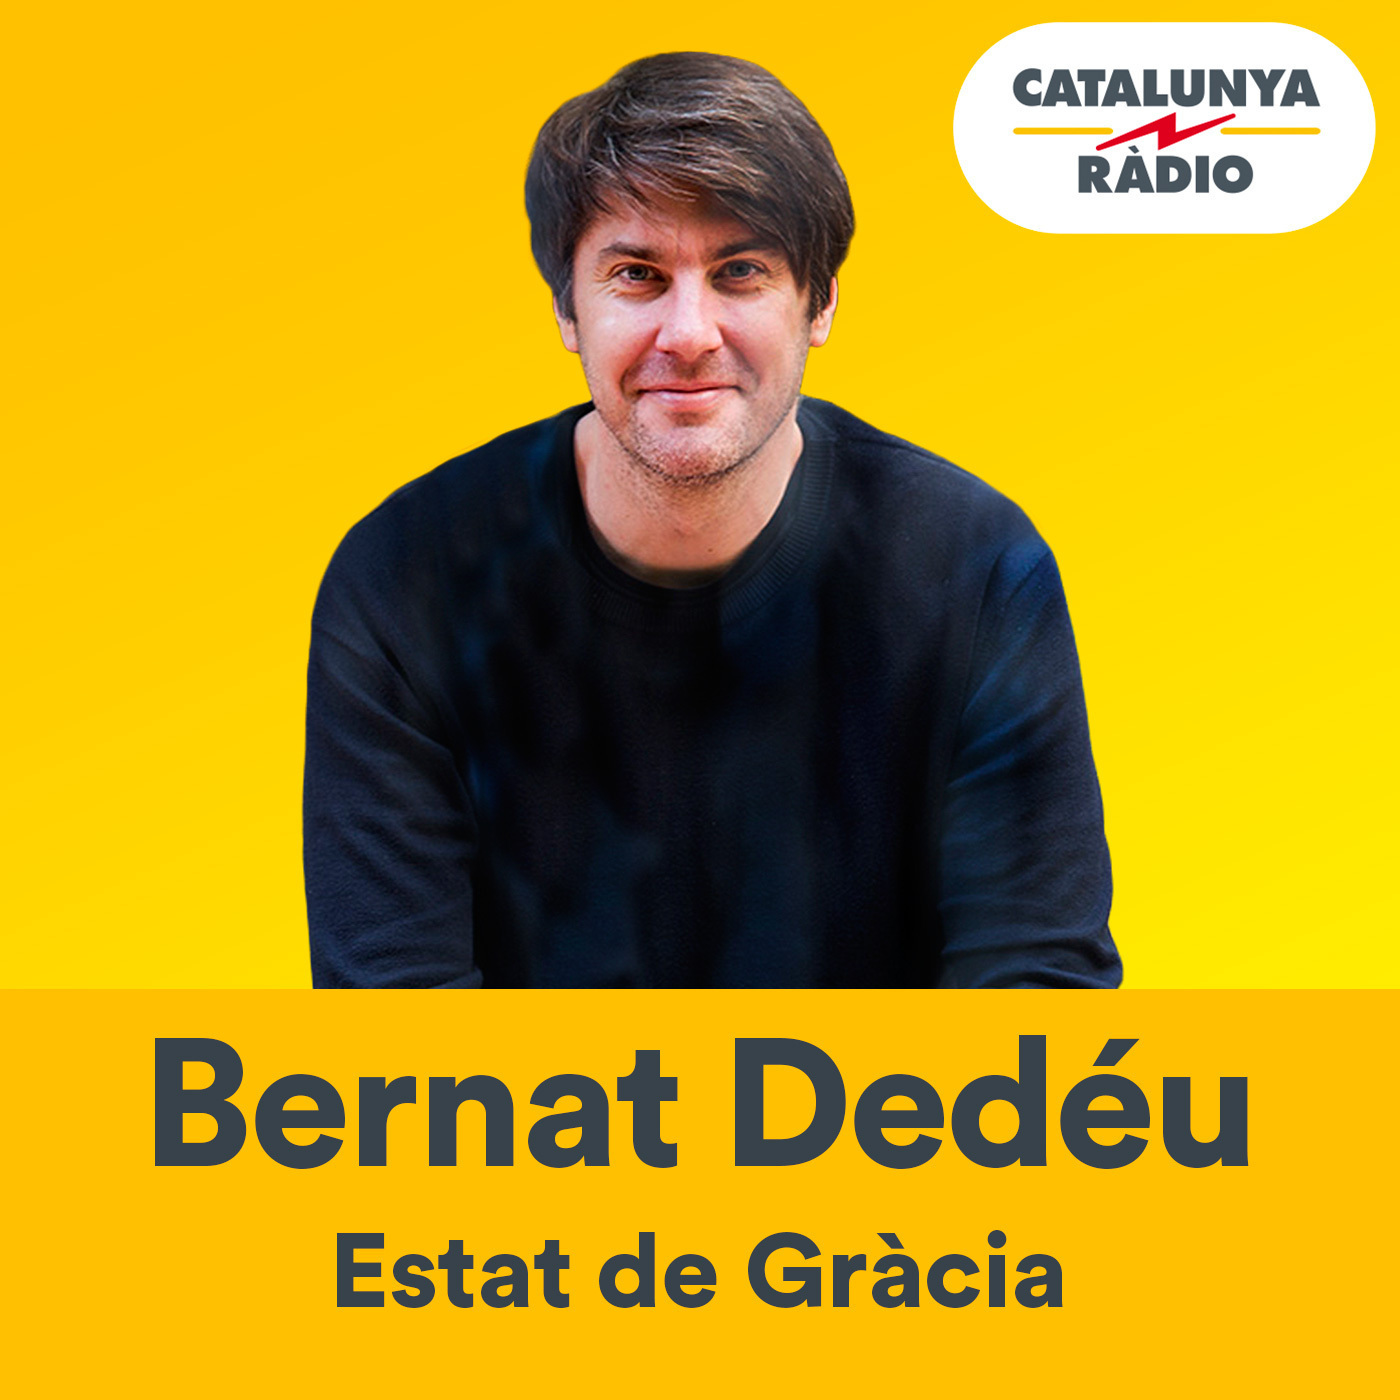 Bernat dedeu